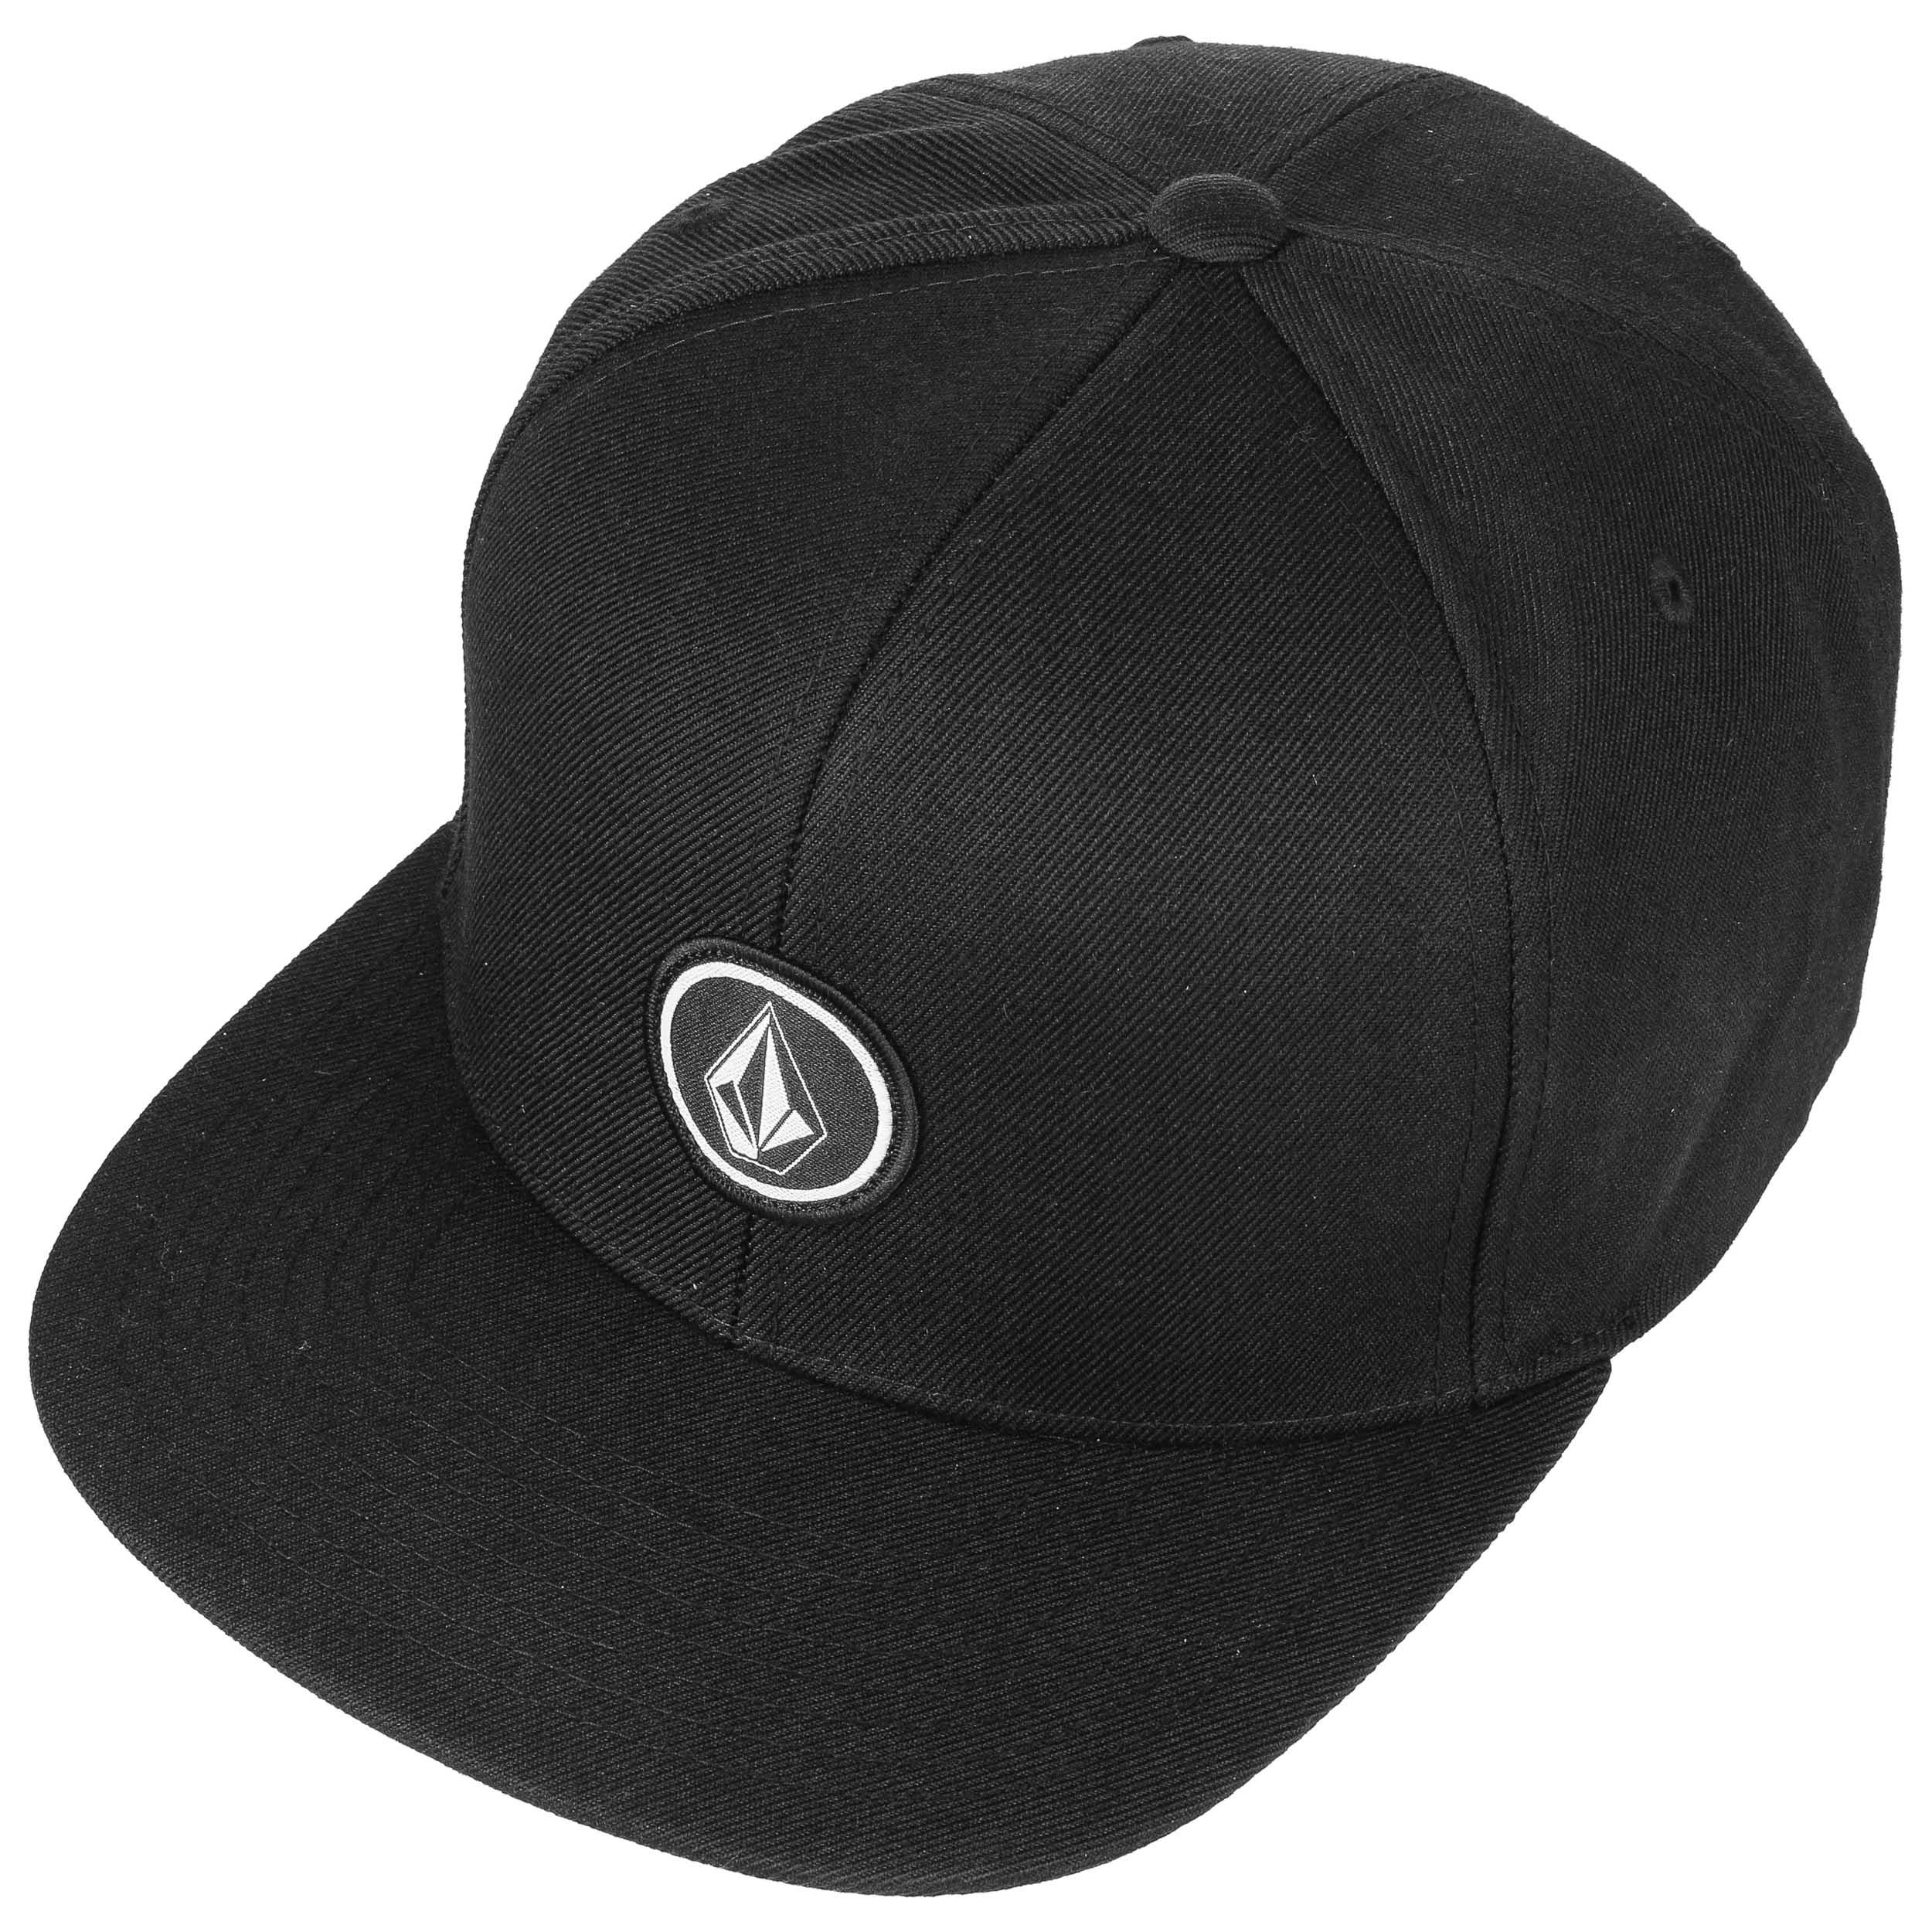 80b7cbba5b65d ... Quarter Twill Snapback Cap by Volcom - black 1 ...